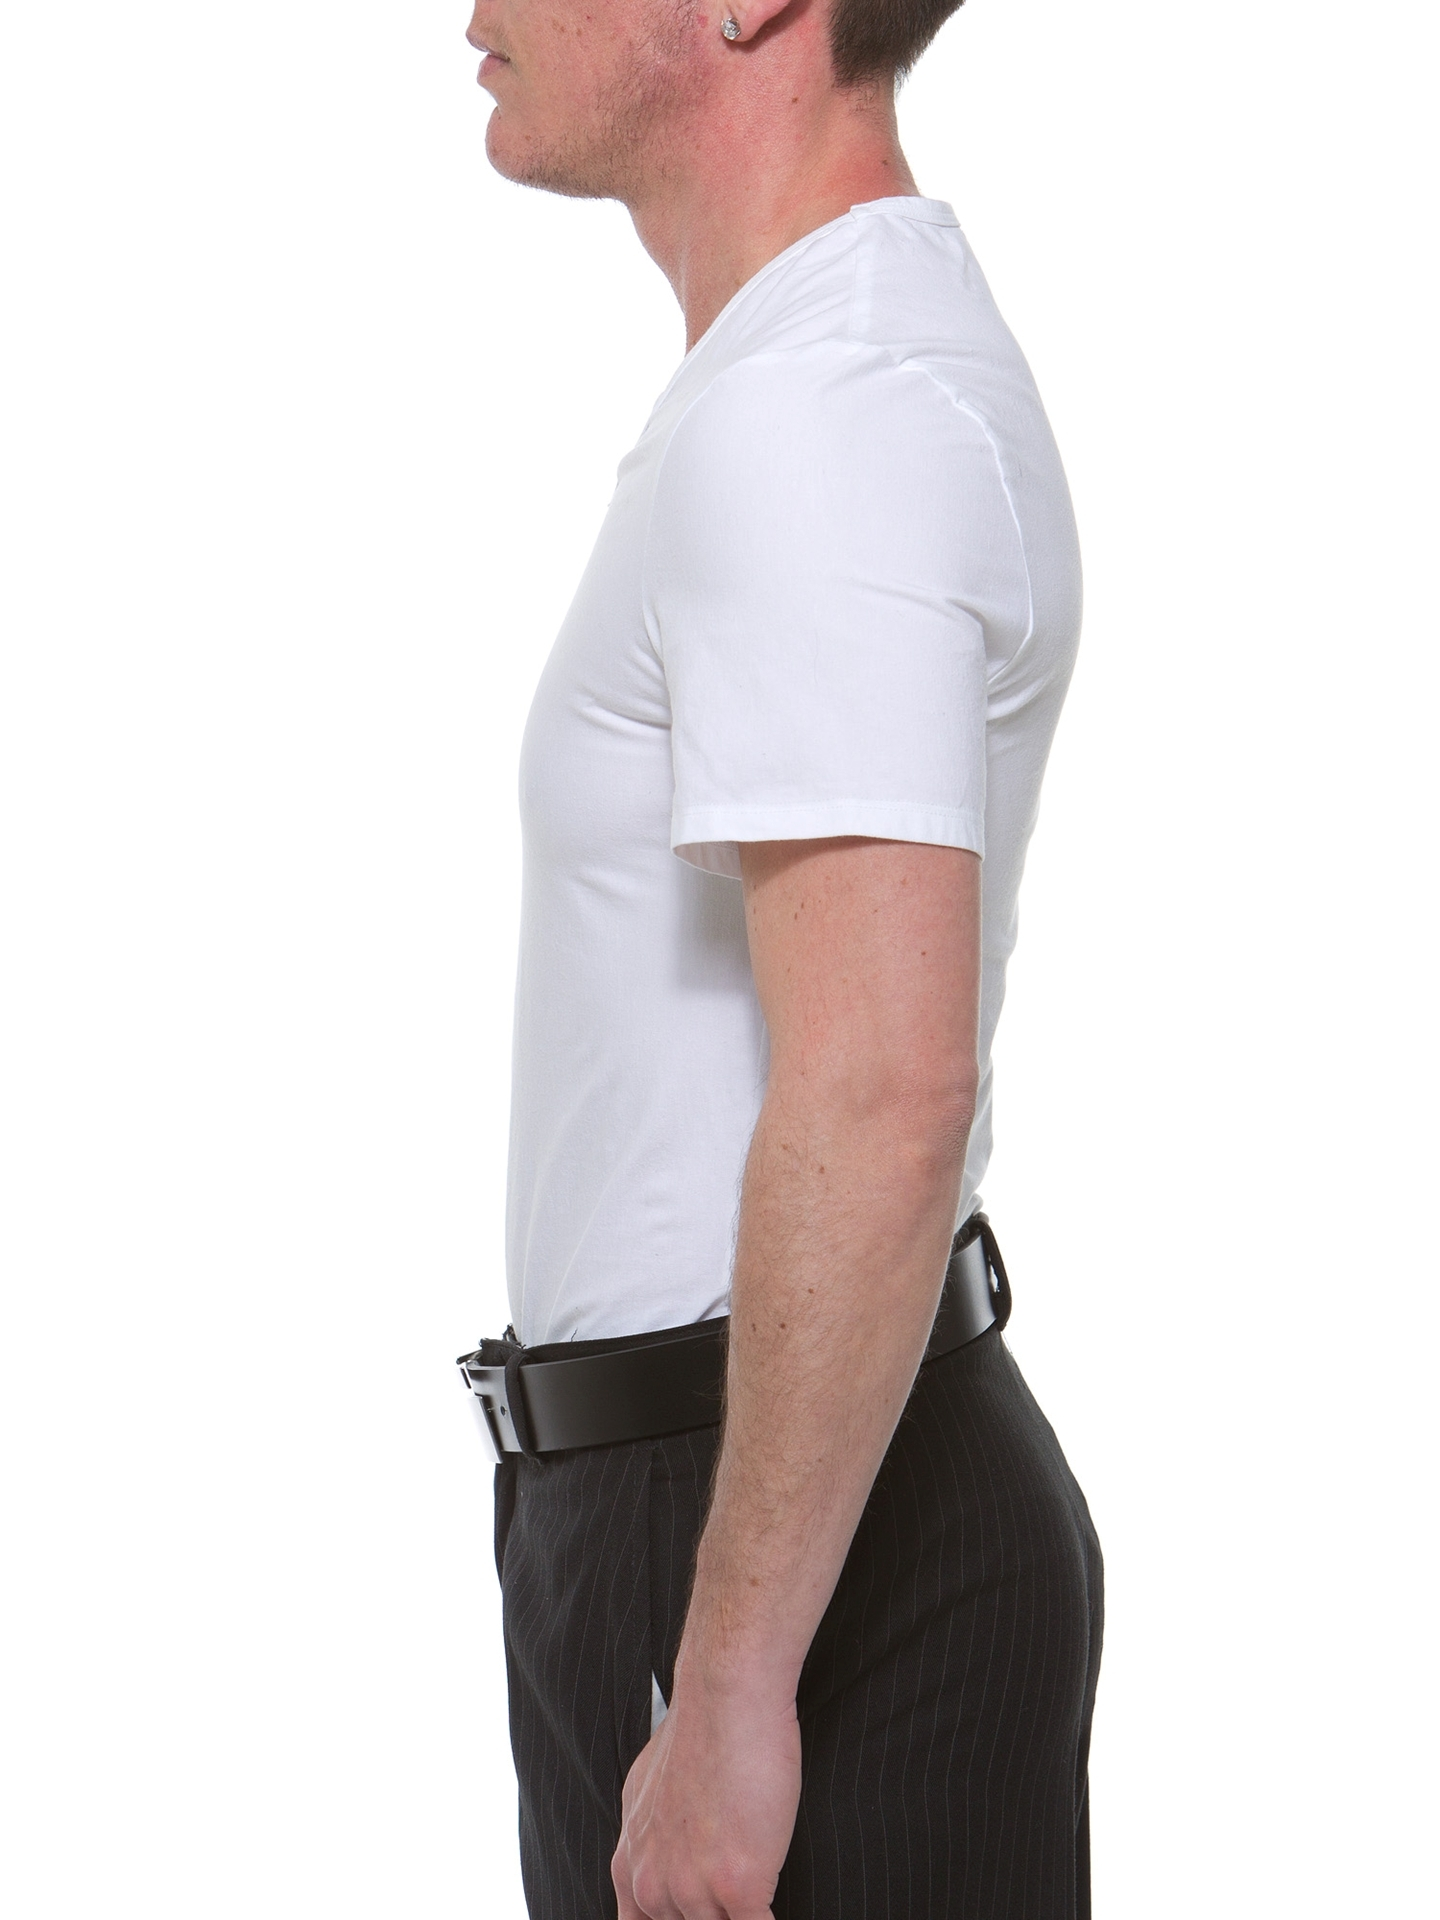 Underworks Mens Extreme Gynecomastia FTM Chest Binder Girdle T-shirt